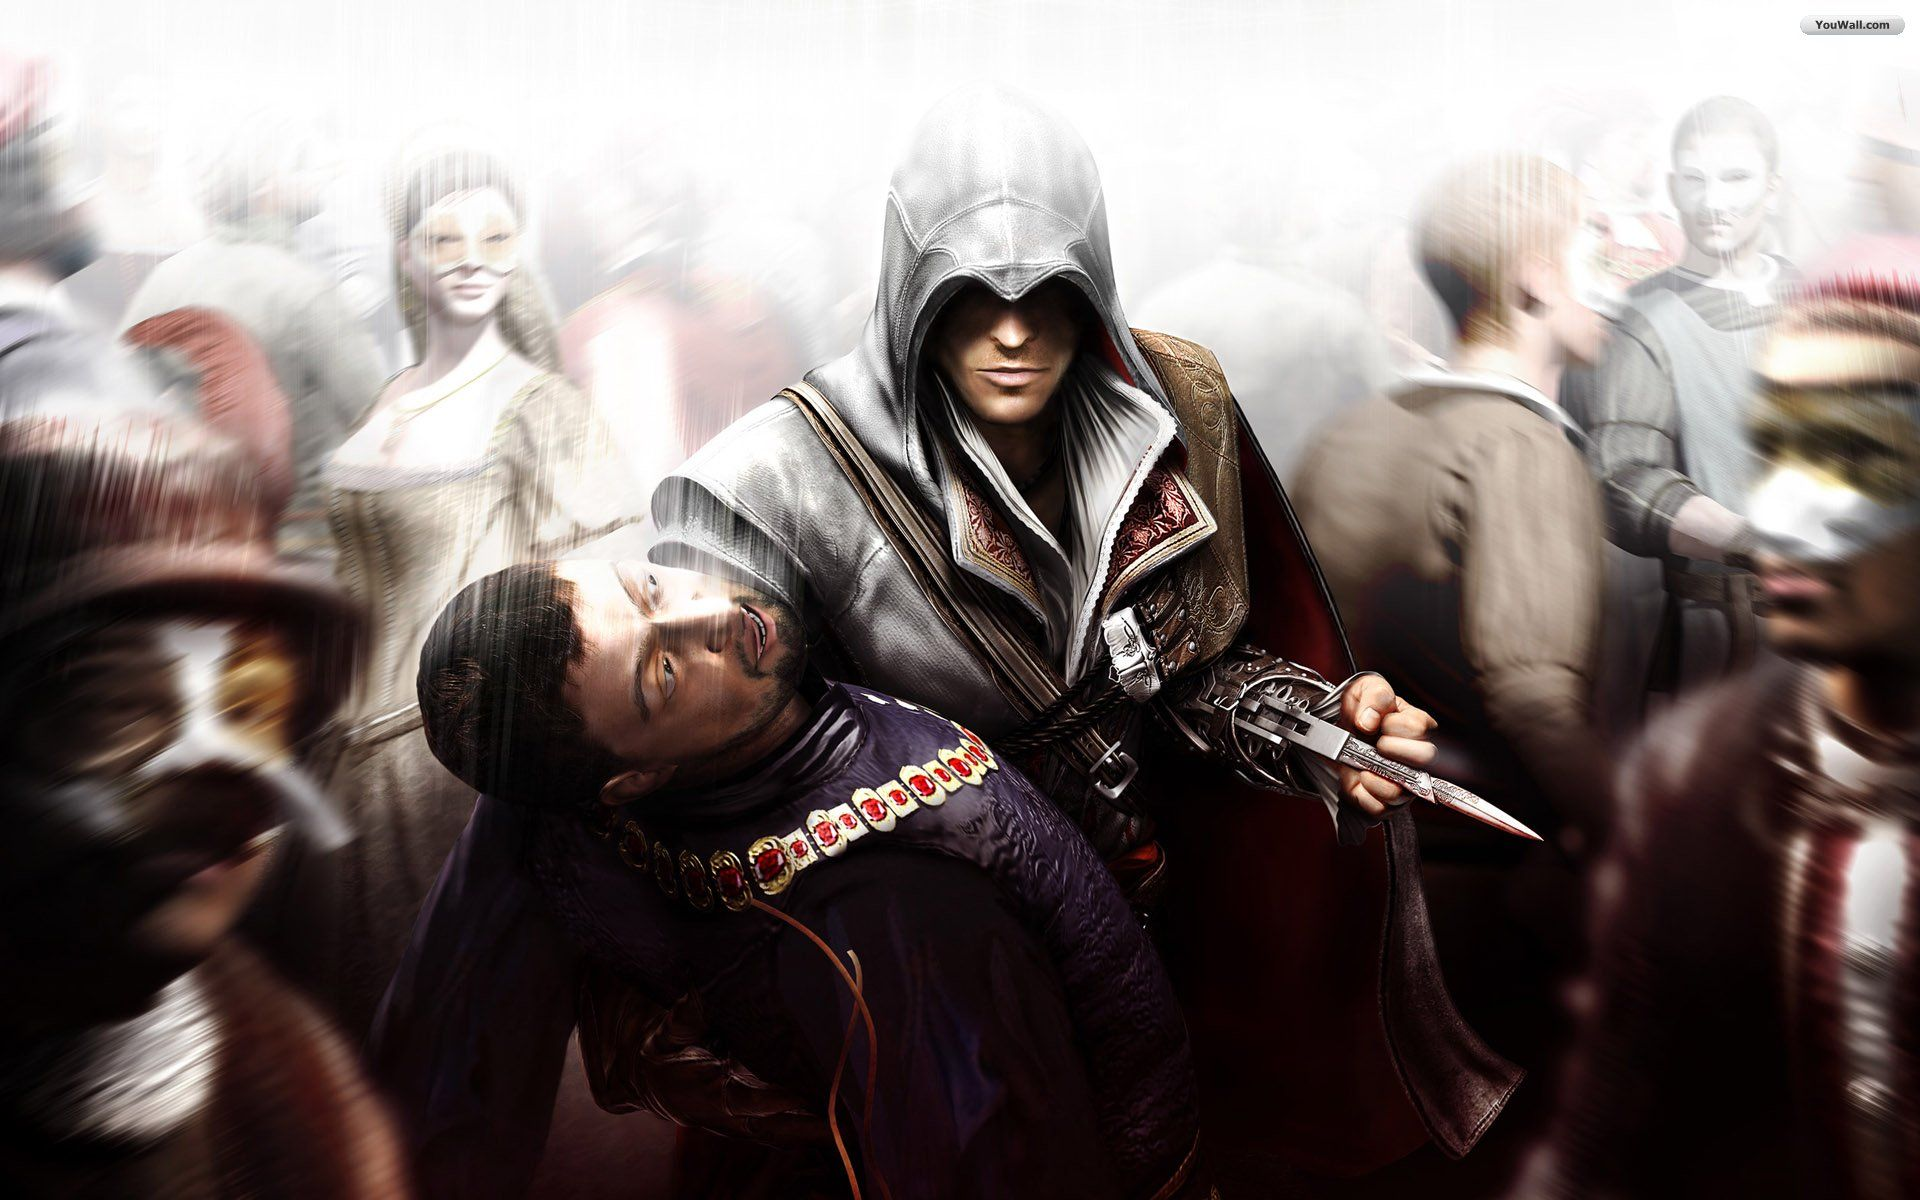 Assassins Creed HD Desktop Wallpaper for K Ultra HD TV